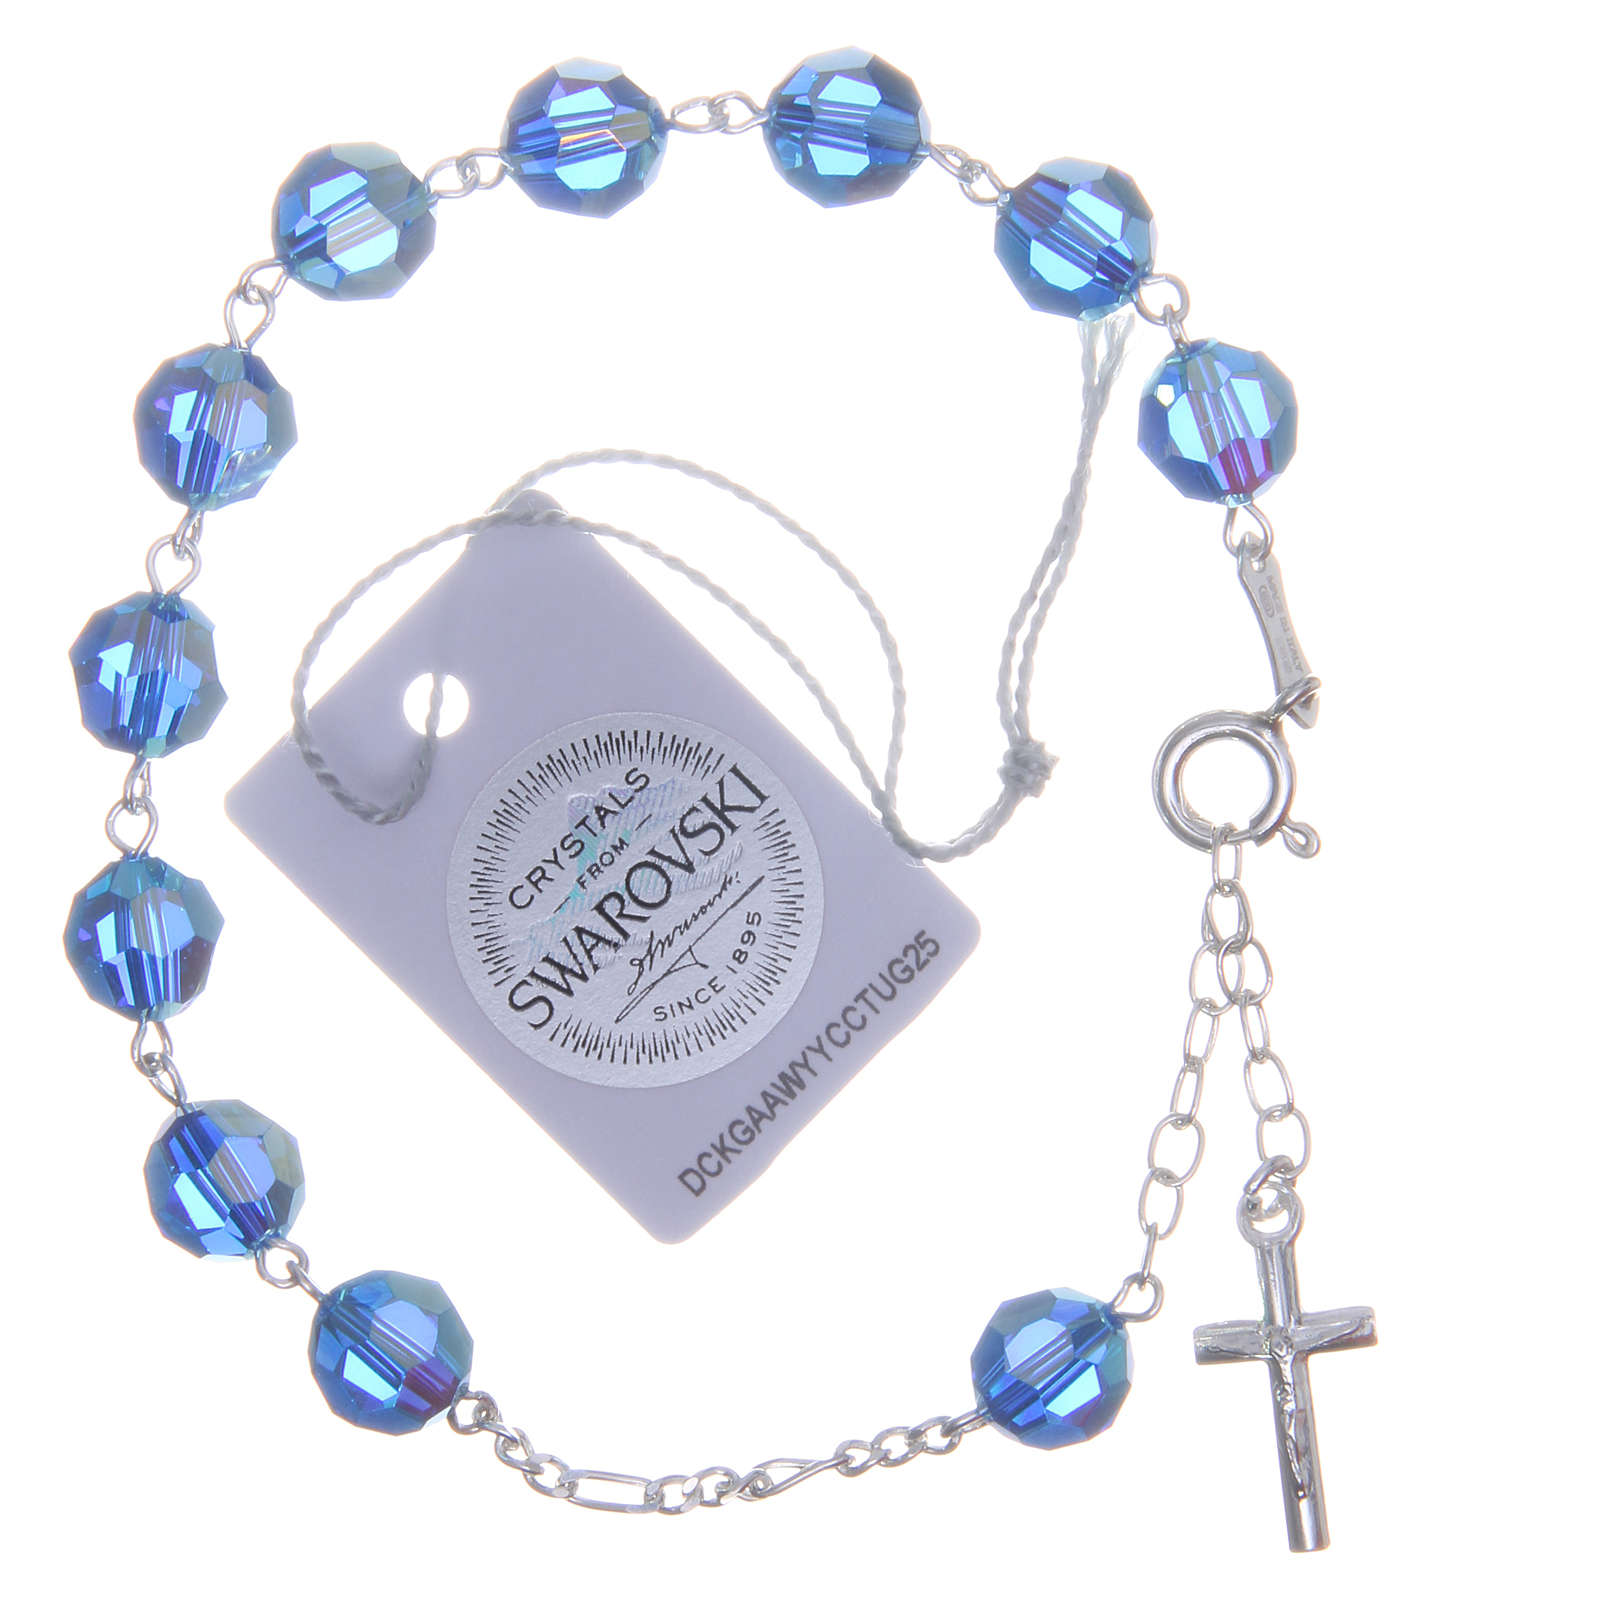 cfb81d6b7 Rosary bracelet in 925 silver with grains measuring 8mm in light blue  Swarovski 4